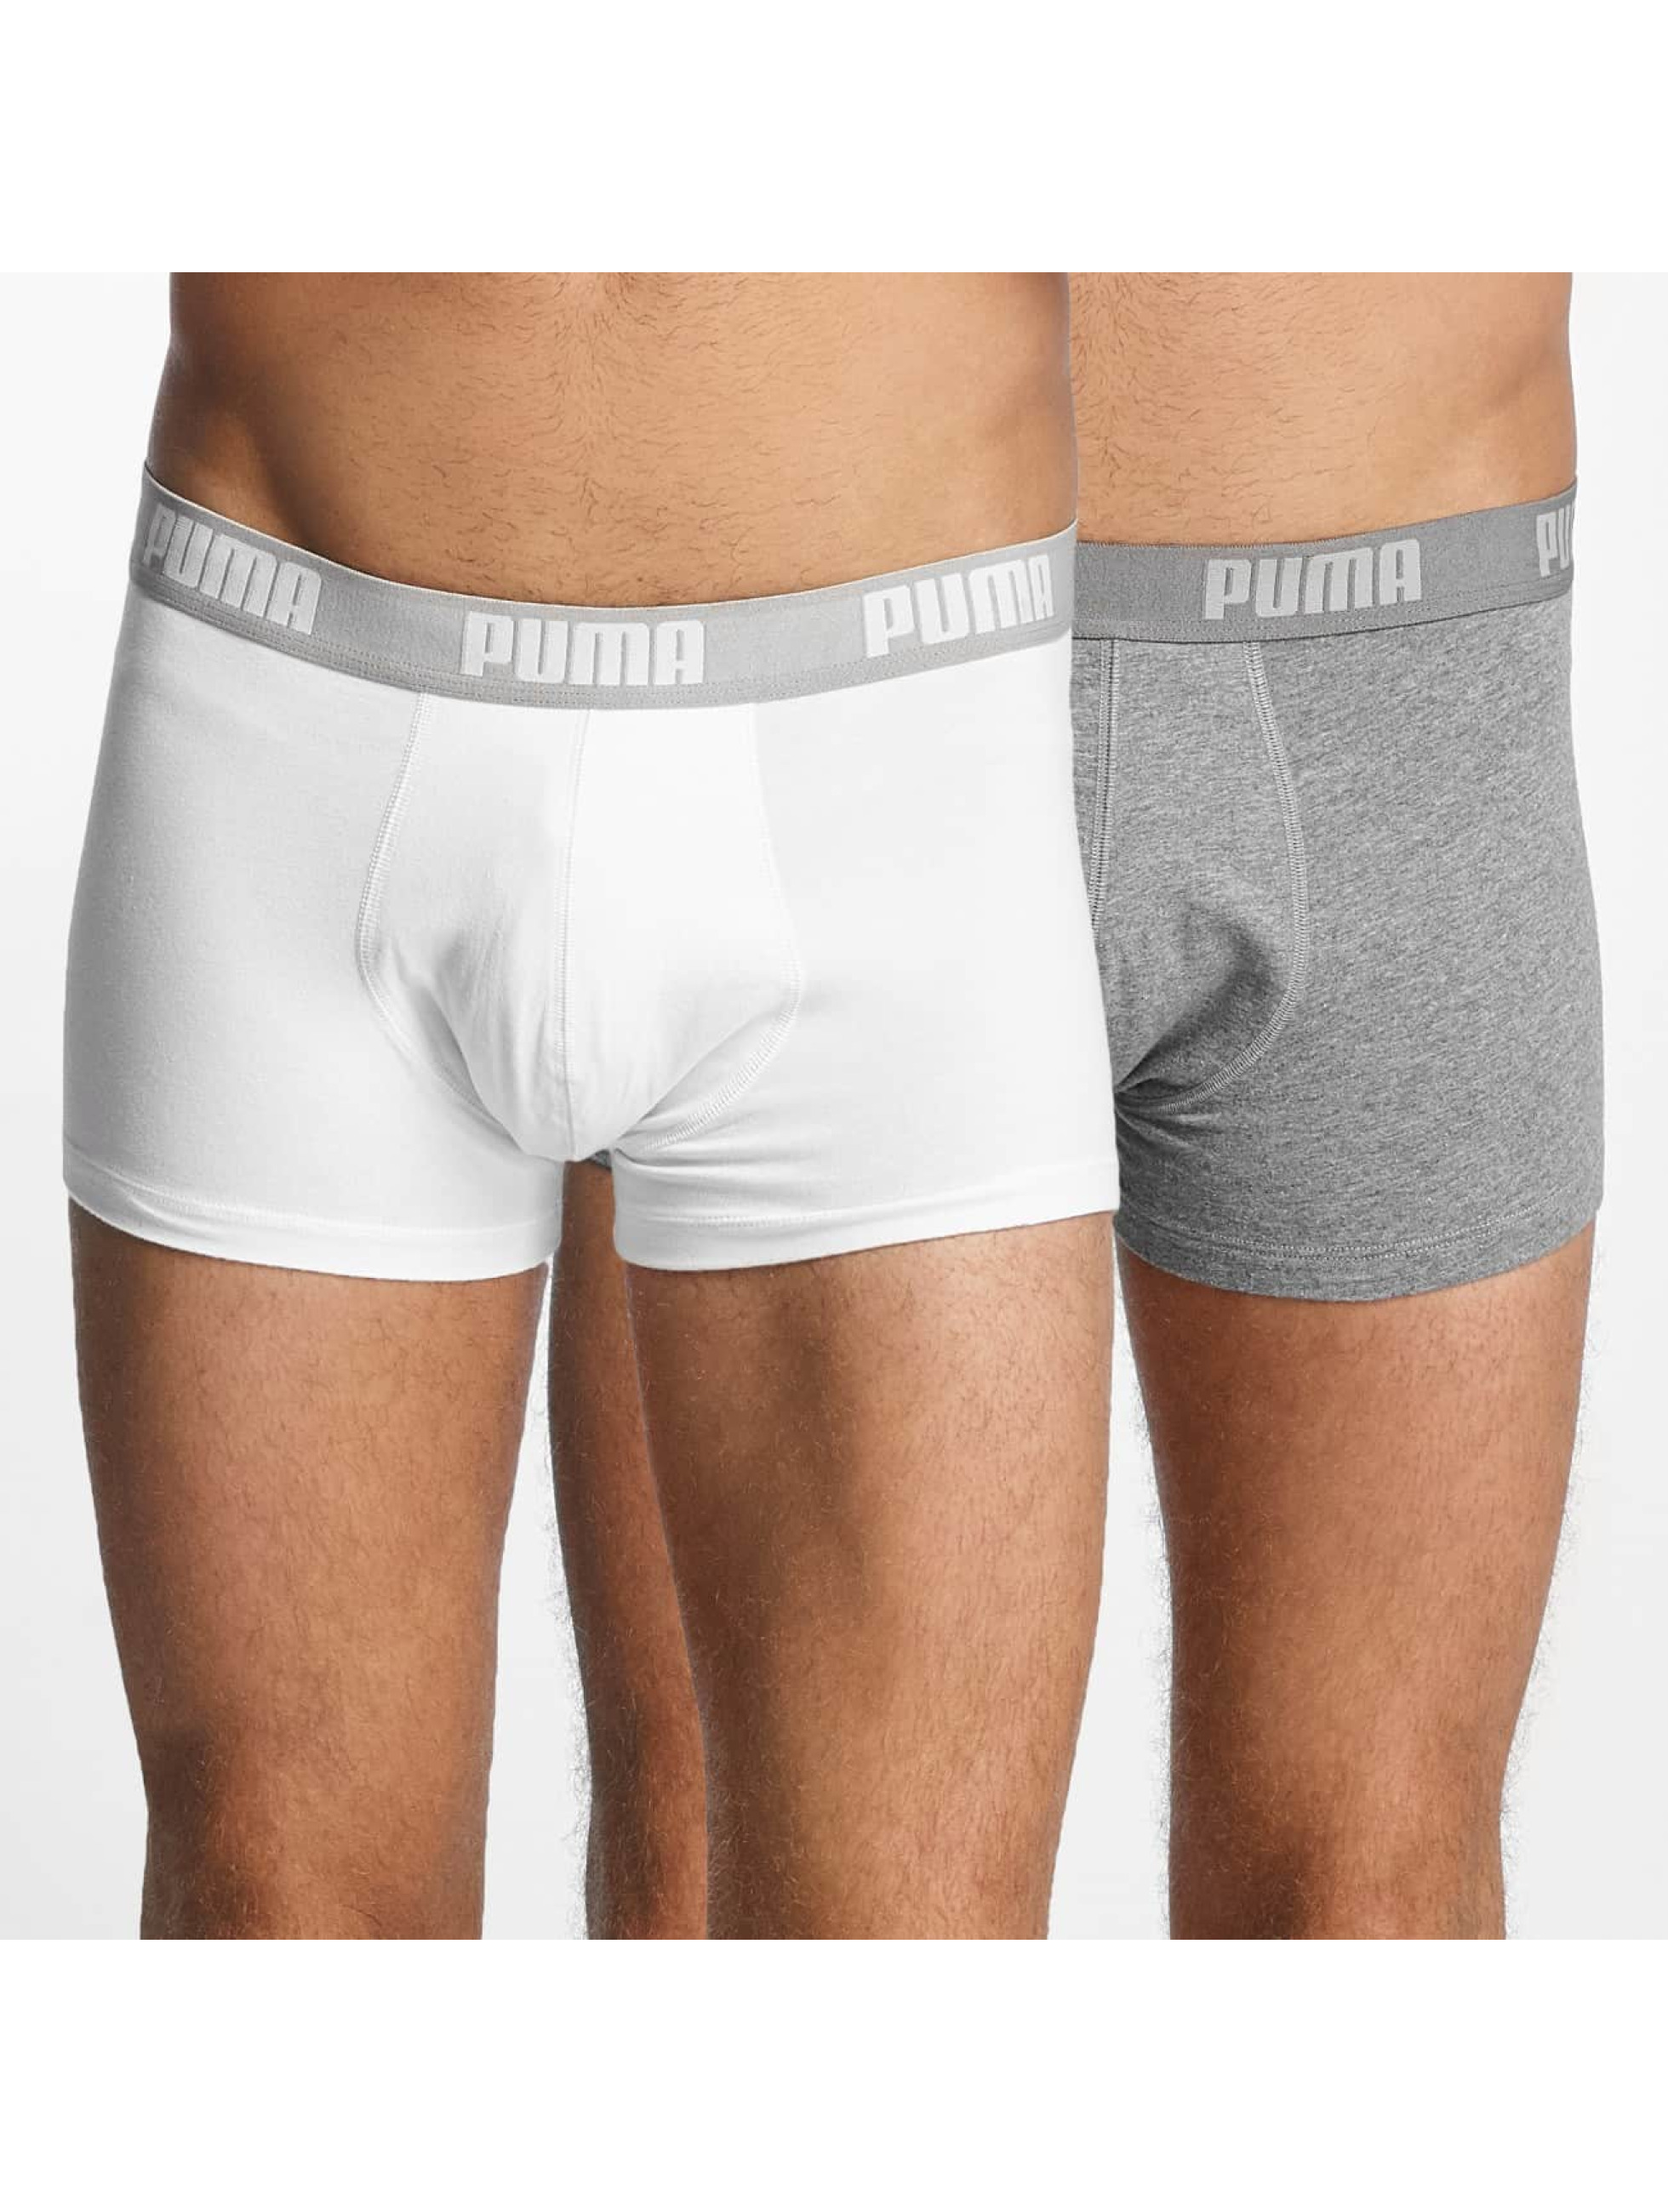 puma herren w sche bademode boxershorts 2 pack basic trunk ebay. Black Bedroom Furniture Sets. Home Design Ideas